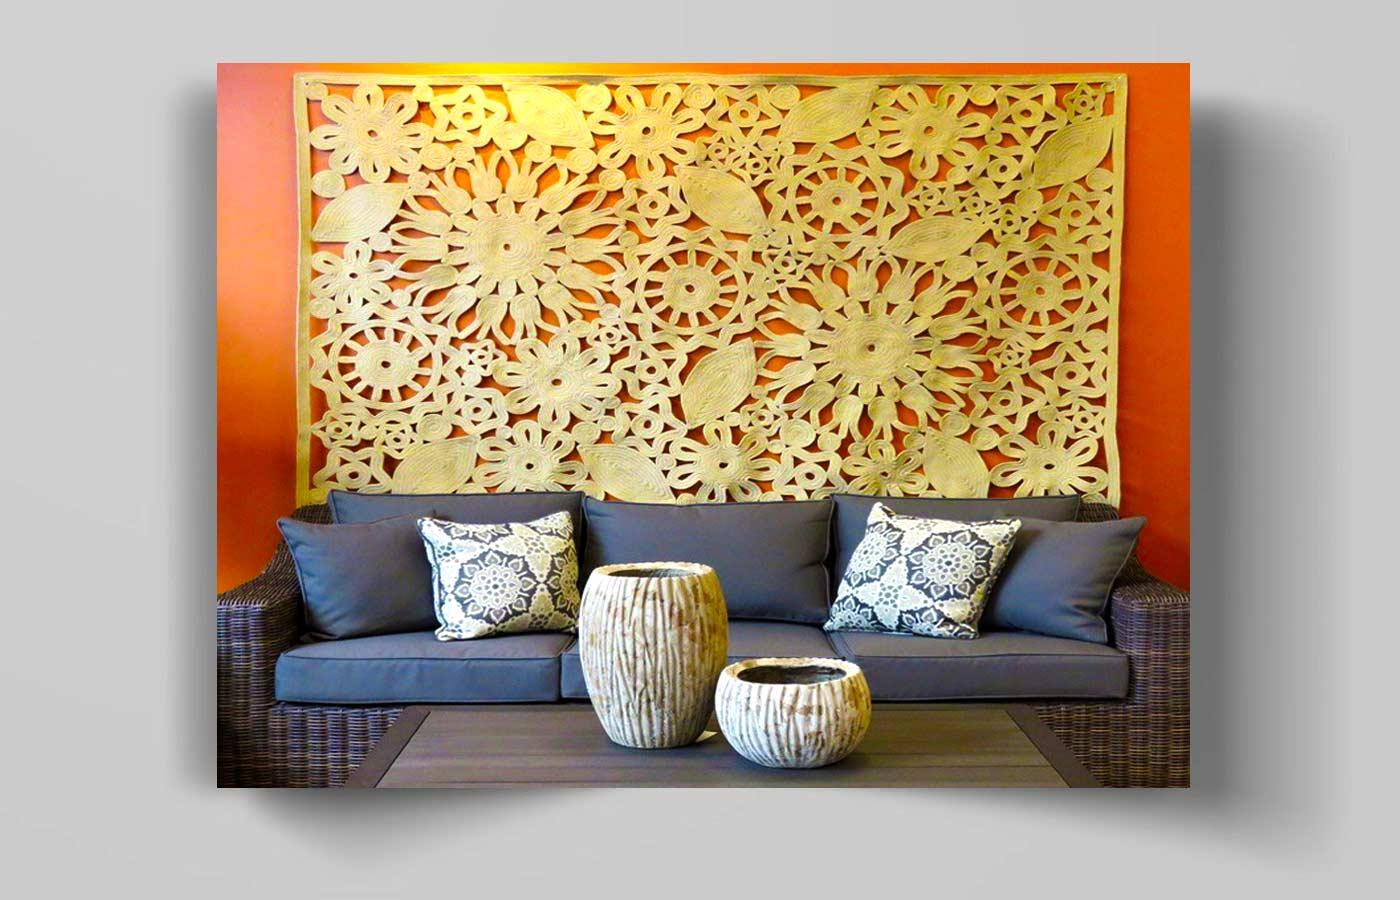 3rt - انواع آویز دیواری در دکوراسیون منزل